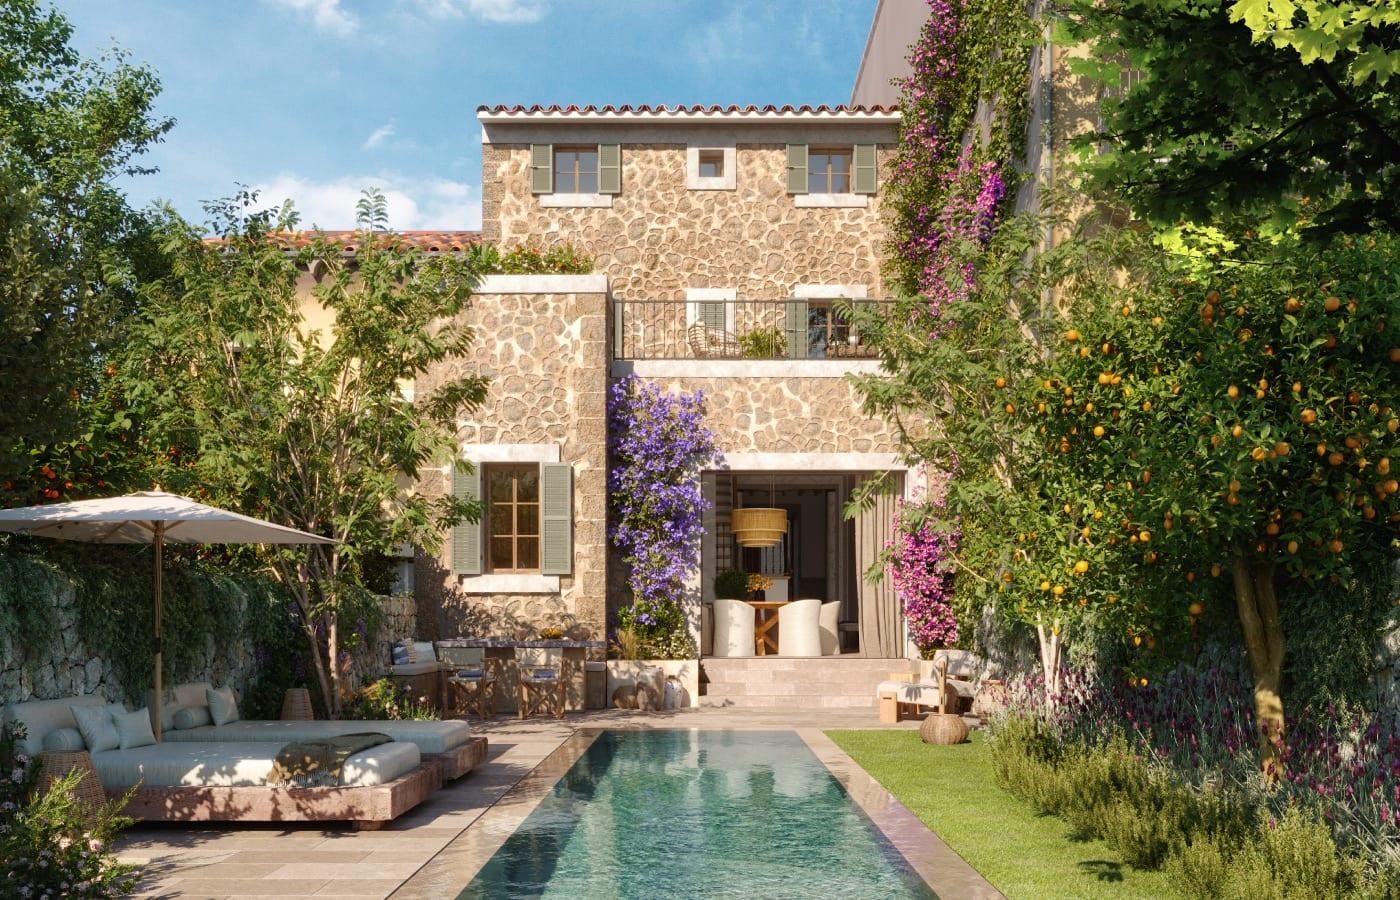 Casa Mares Property Mallorca Berrow Projects Day 4 2